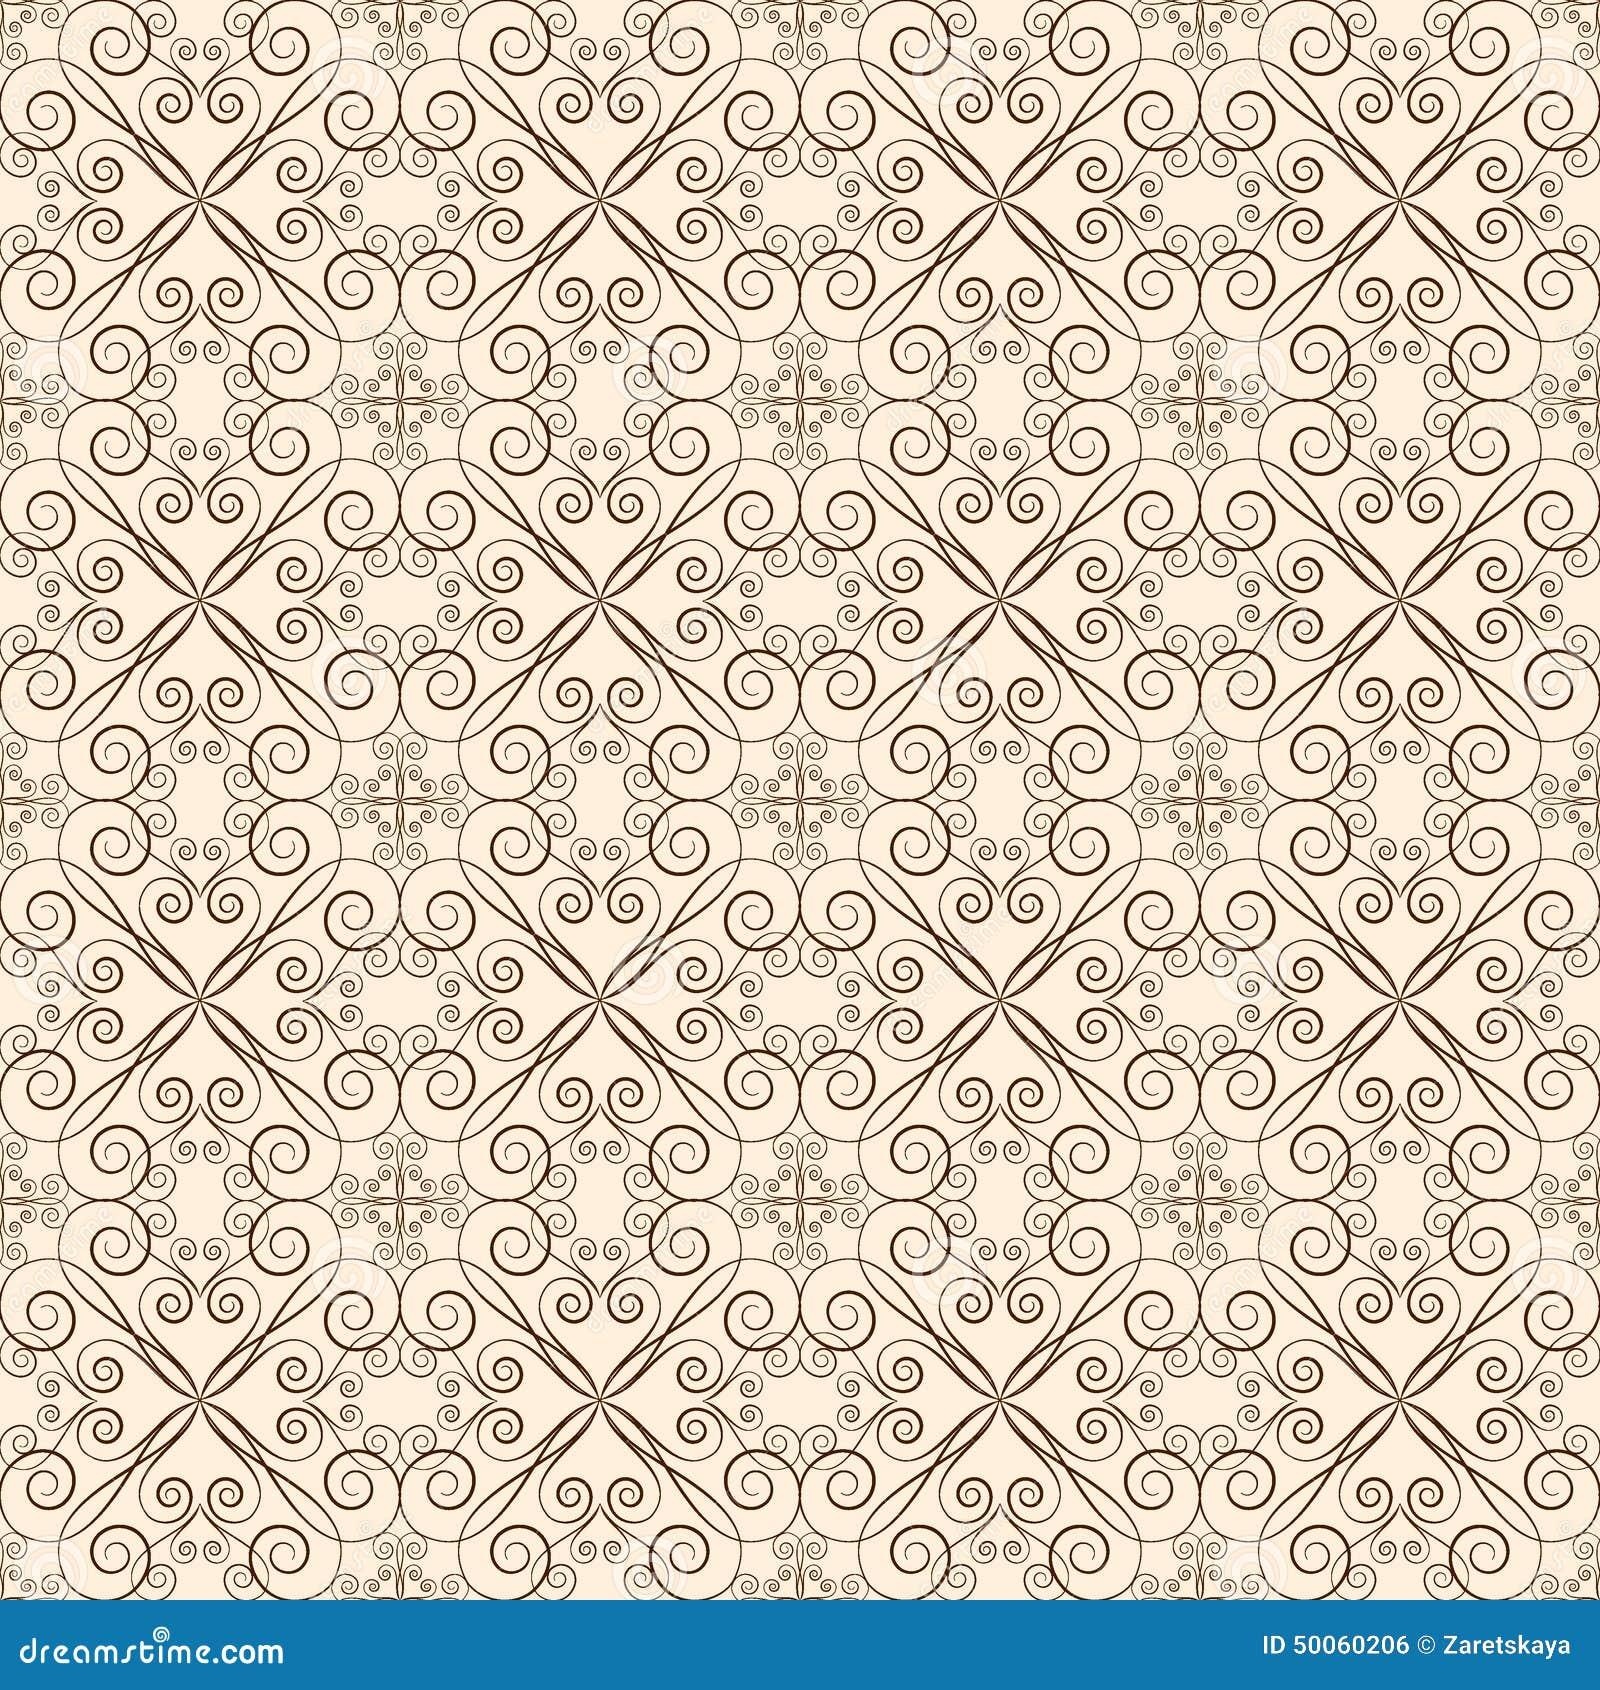 Formal Backgrounds Patterns Patterns Kid